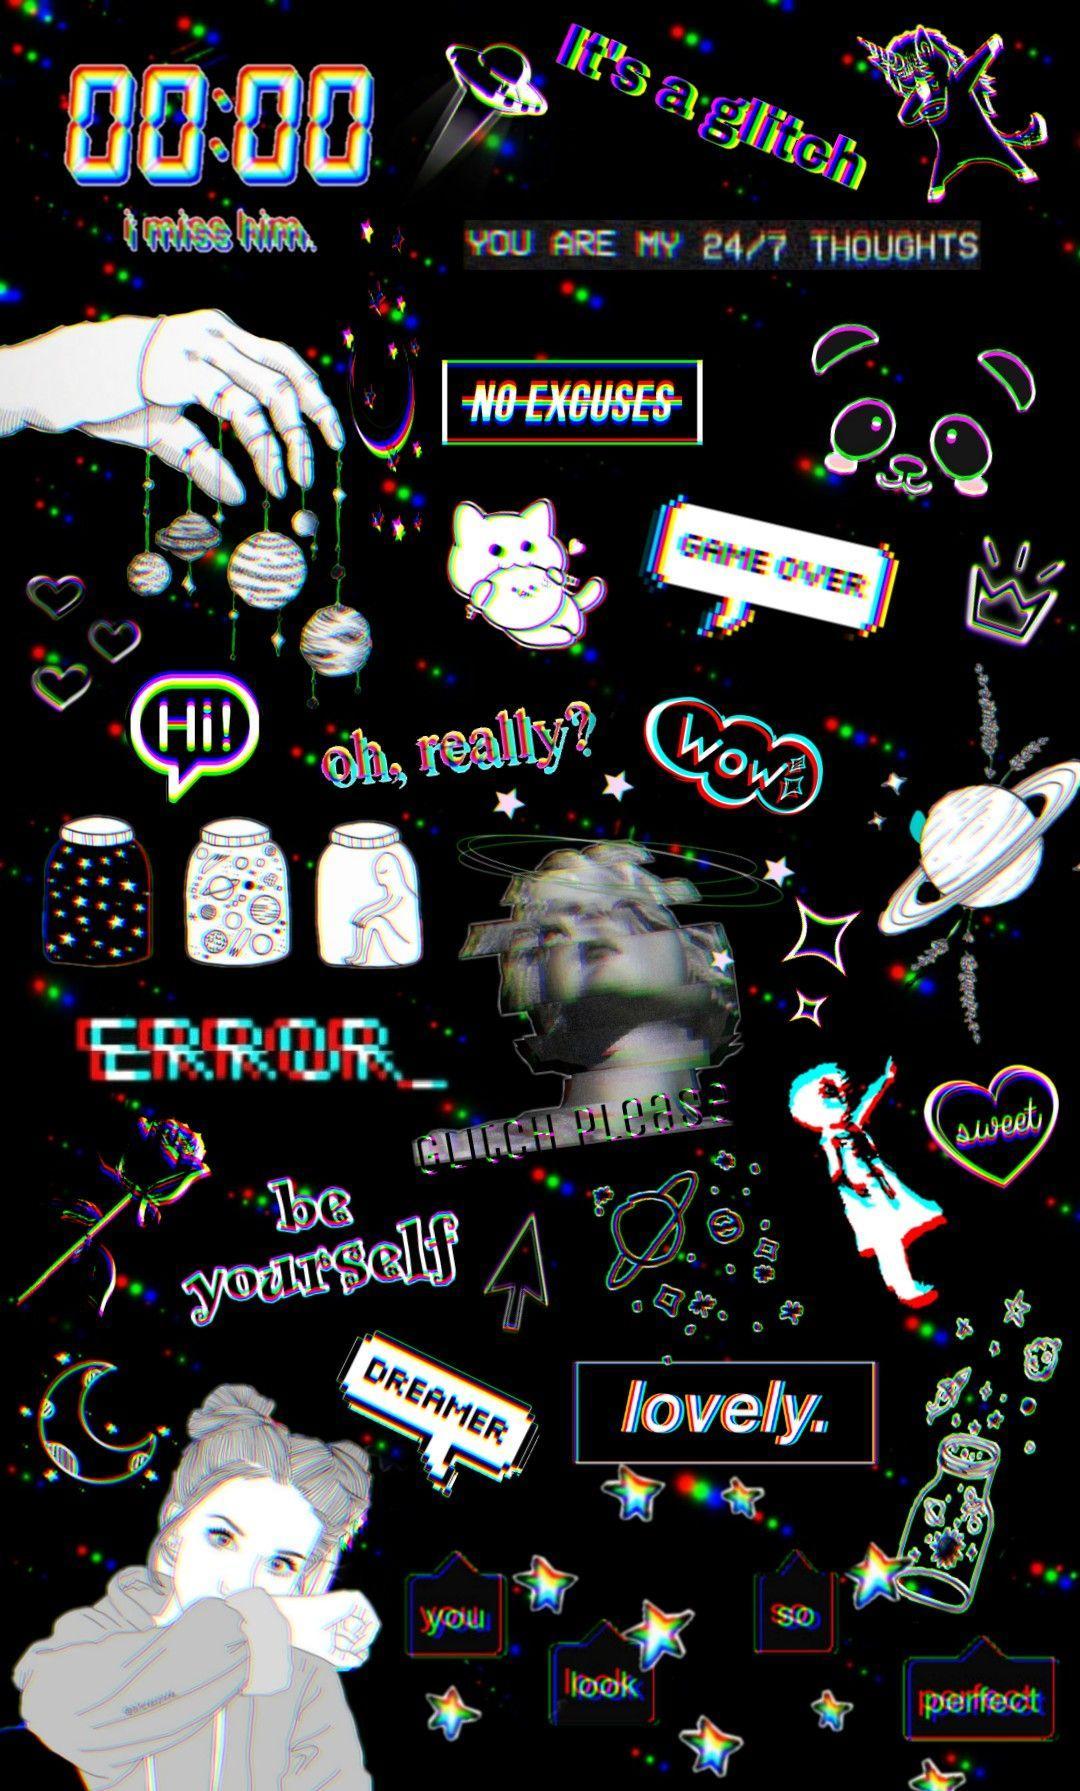 Aesthetic Glitch Hd Wallpapers Top Free Aesthetic Glitch Hd Backgrounds Wallpaperaccess Scary japan kawaii meme 4chan vhs 90s 80s skeleton spooky desu glitch seapunk glitch art vcr aesthetic aesthetics net art vaporwave yung lean sadboys vaporwave art sadboys2001 seapunk art dank meme. aesthetic glitch hd wallpapers top